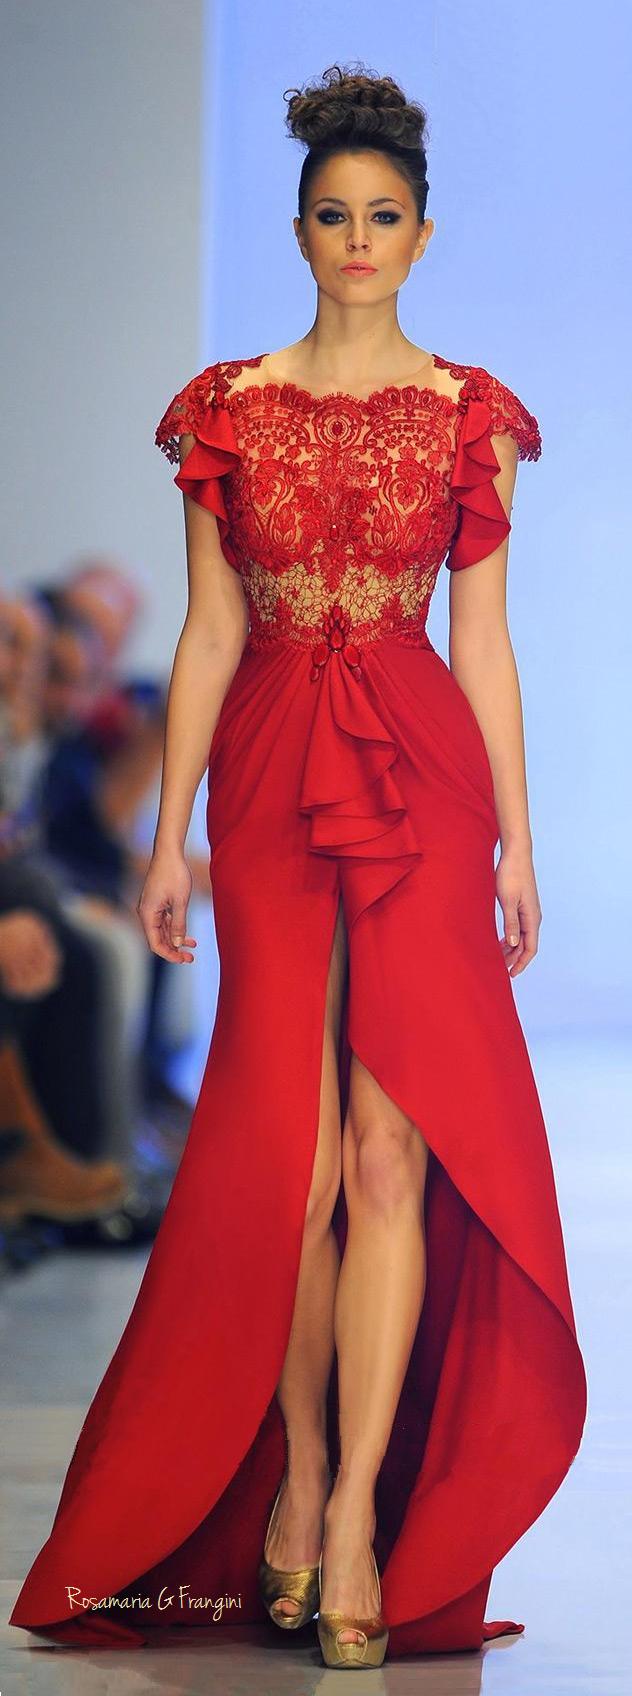 Fashion Dresses | Rosamaria G Frangini || MNM Fouad Sarkis